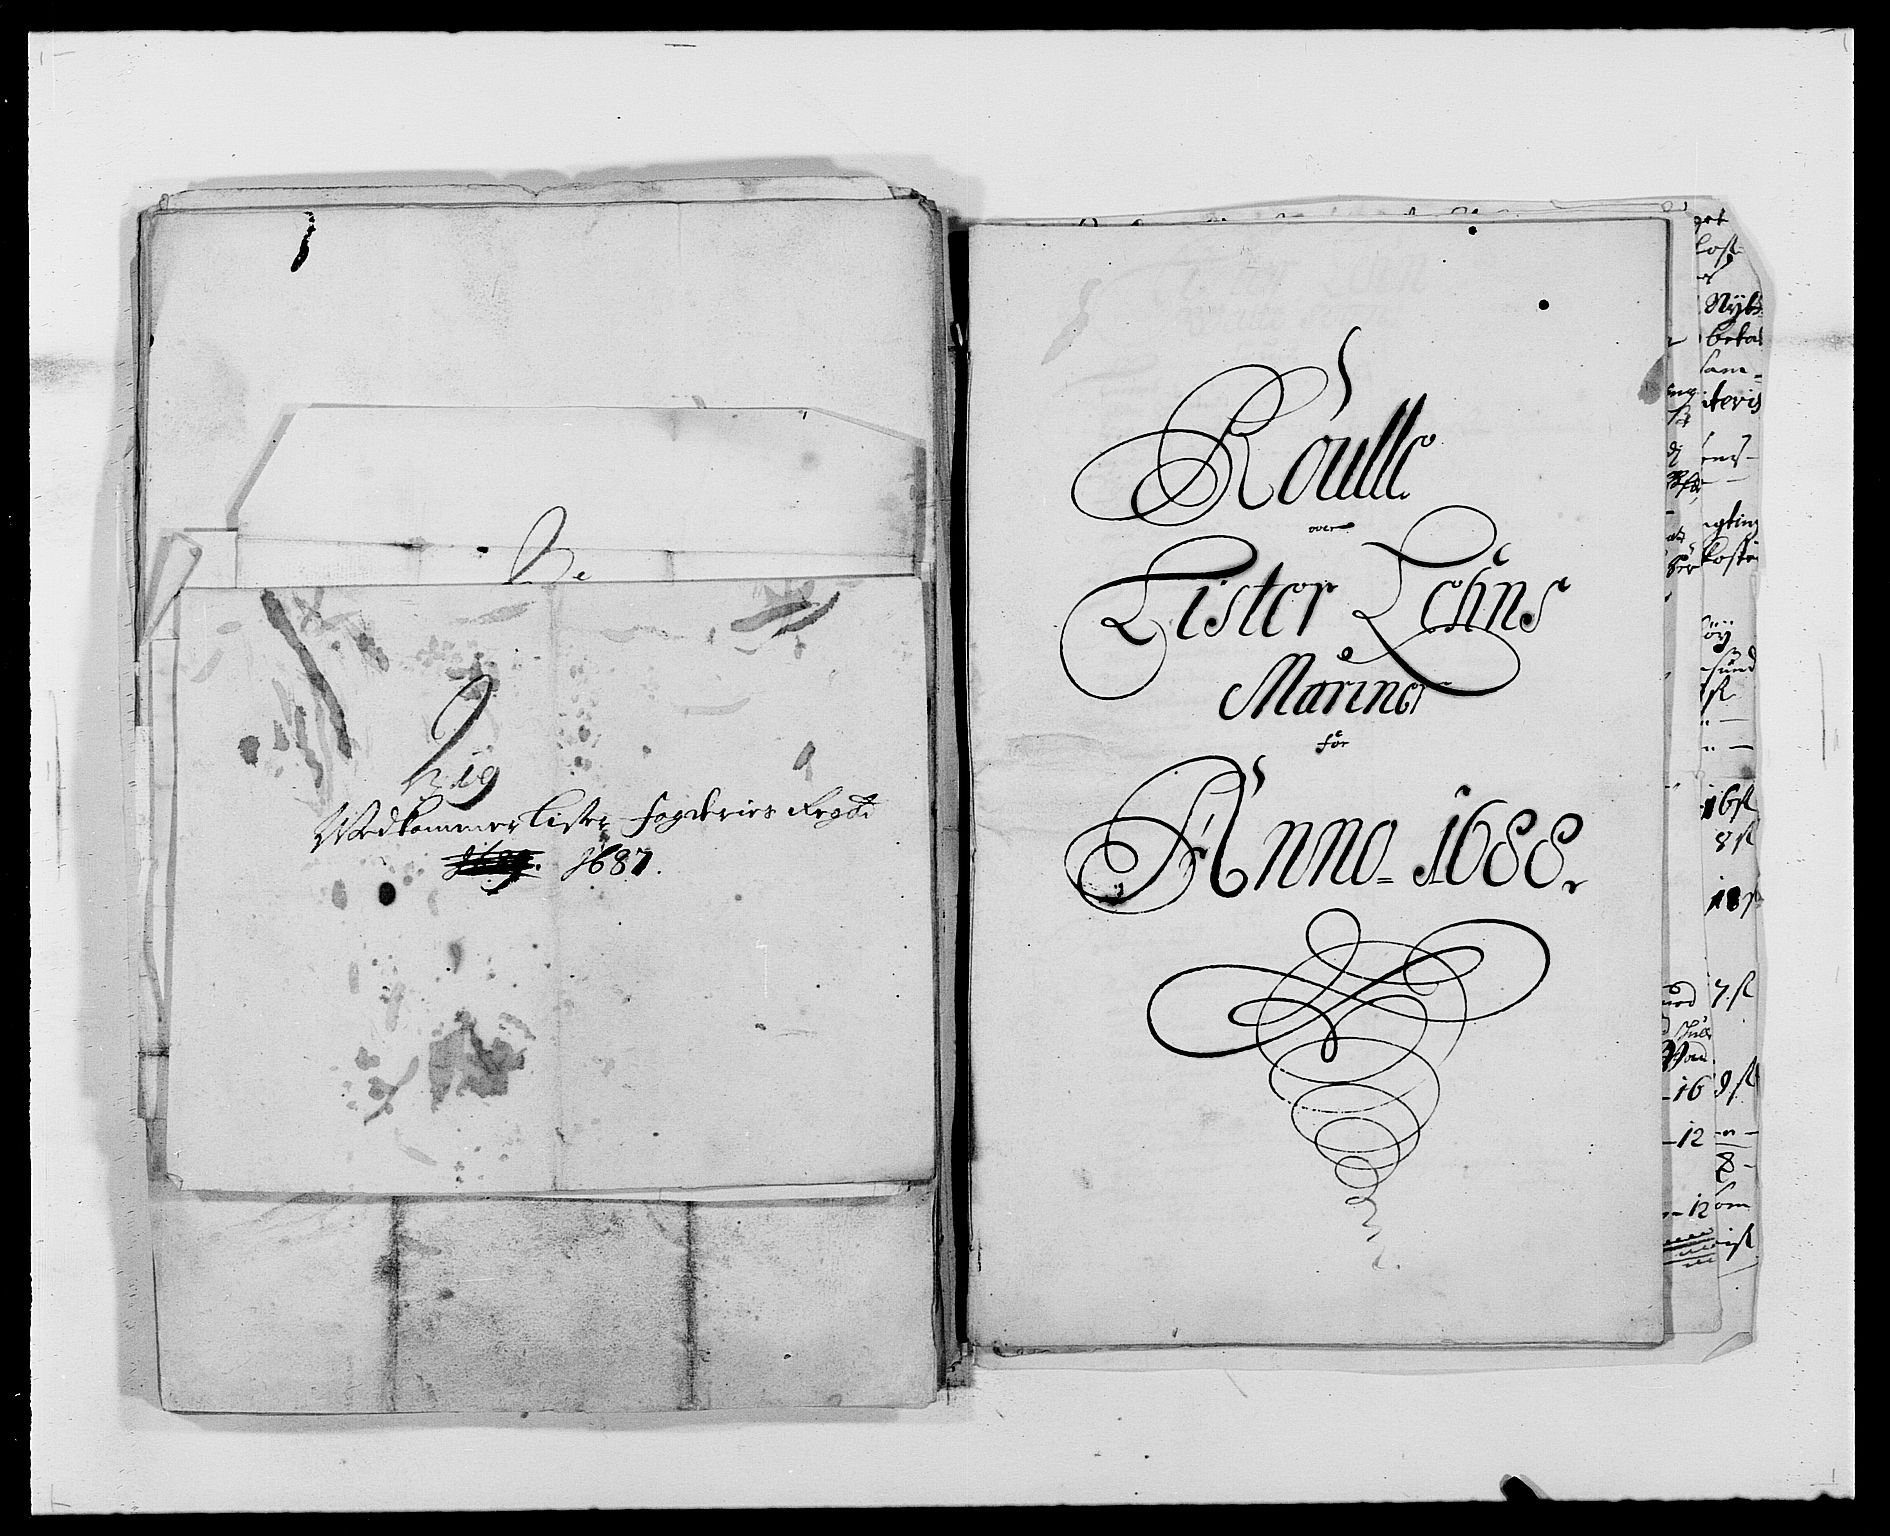 RA, Rentekammeret inntil 1814, Reviderte regnskaper, Fogderegnskap, R41/L2535: Fogderegnskap Lista, 1686-1689, s. 91